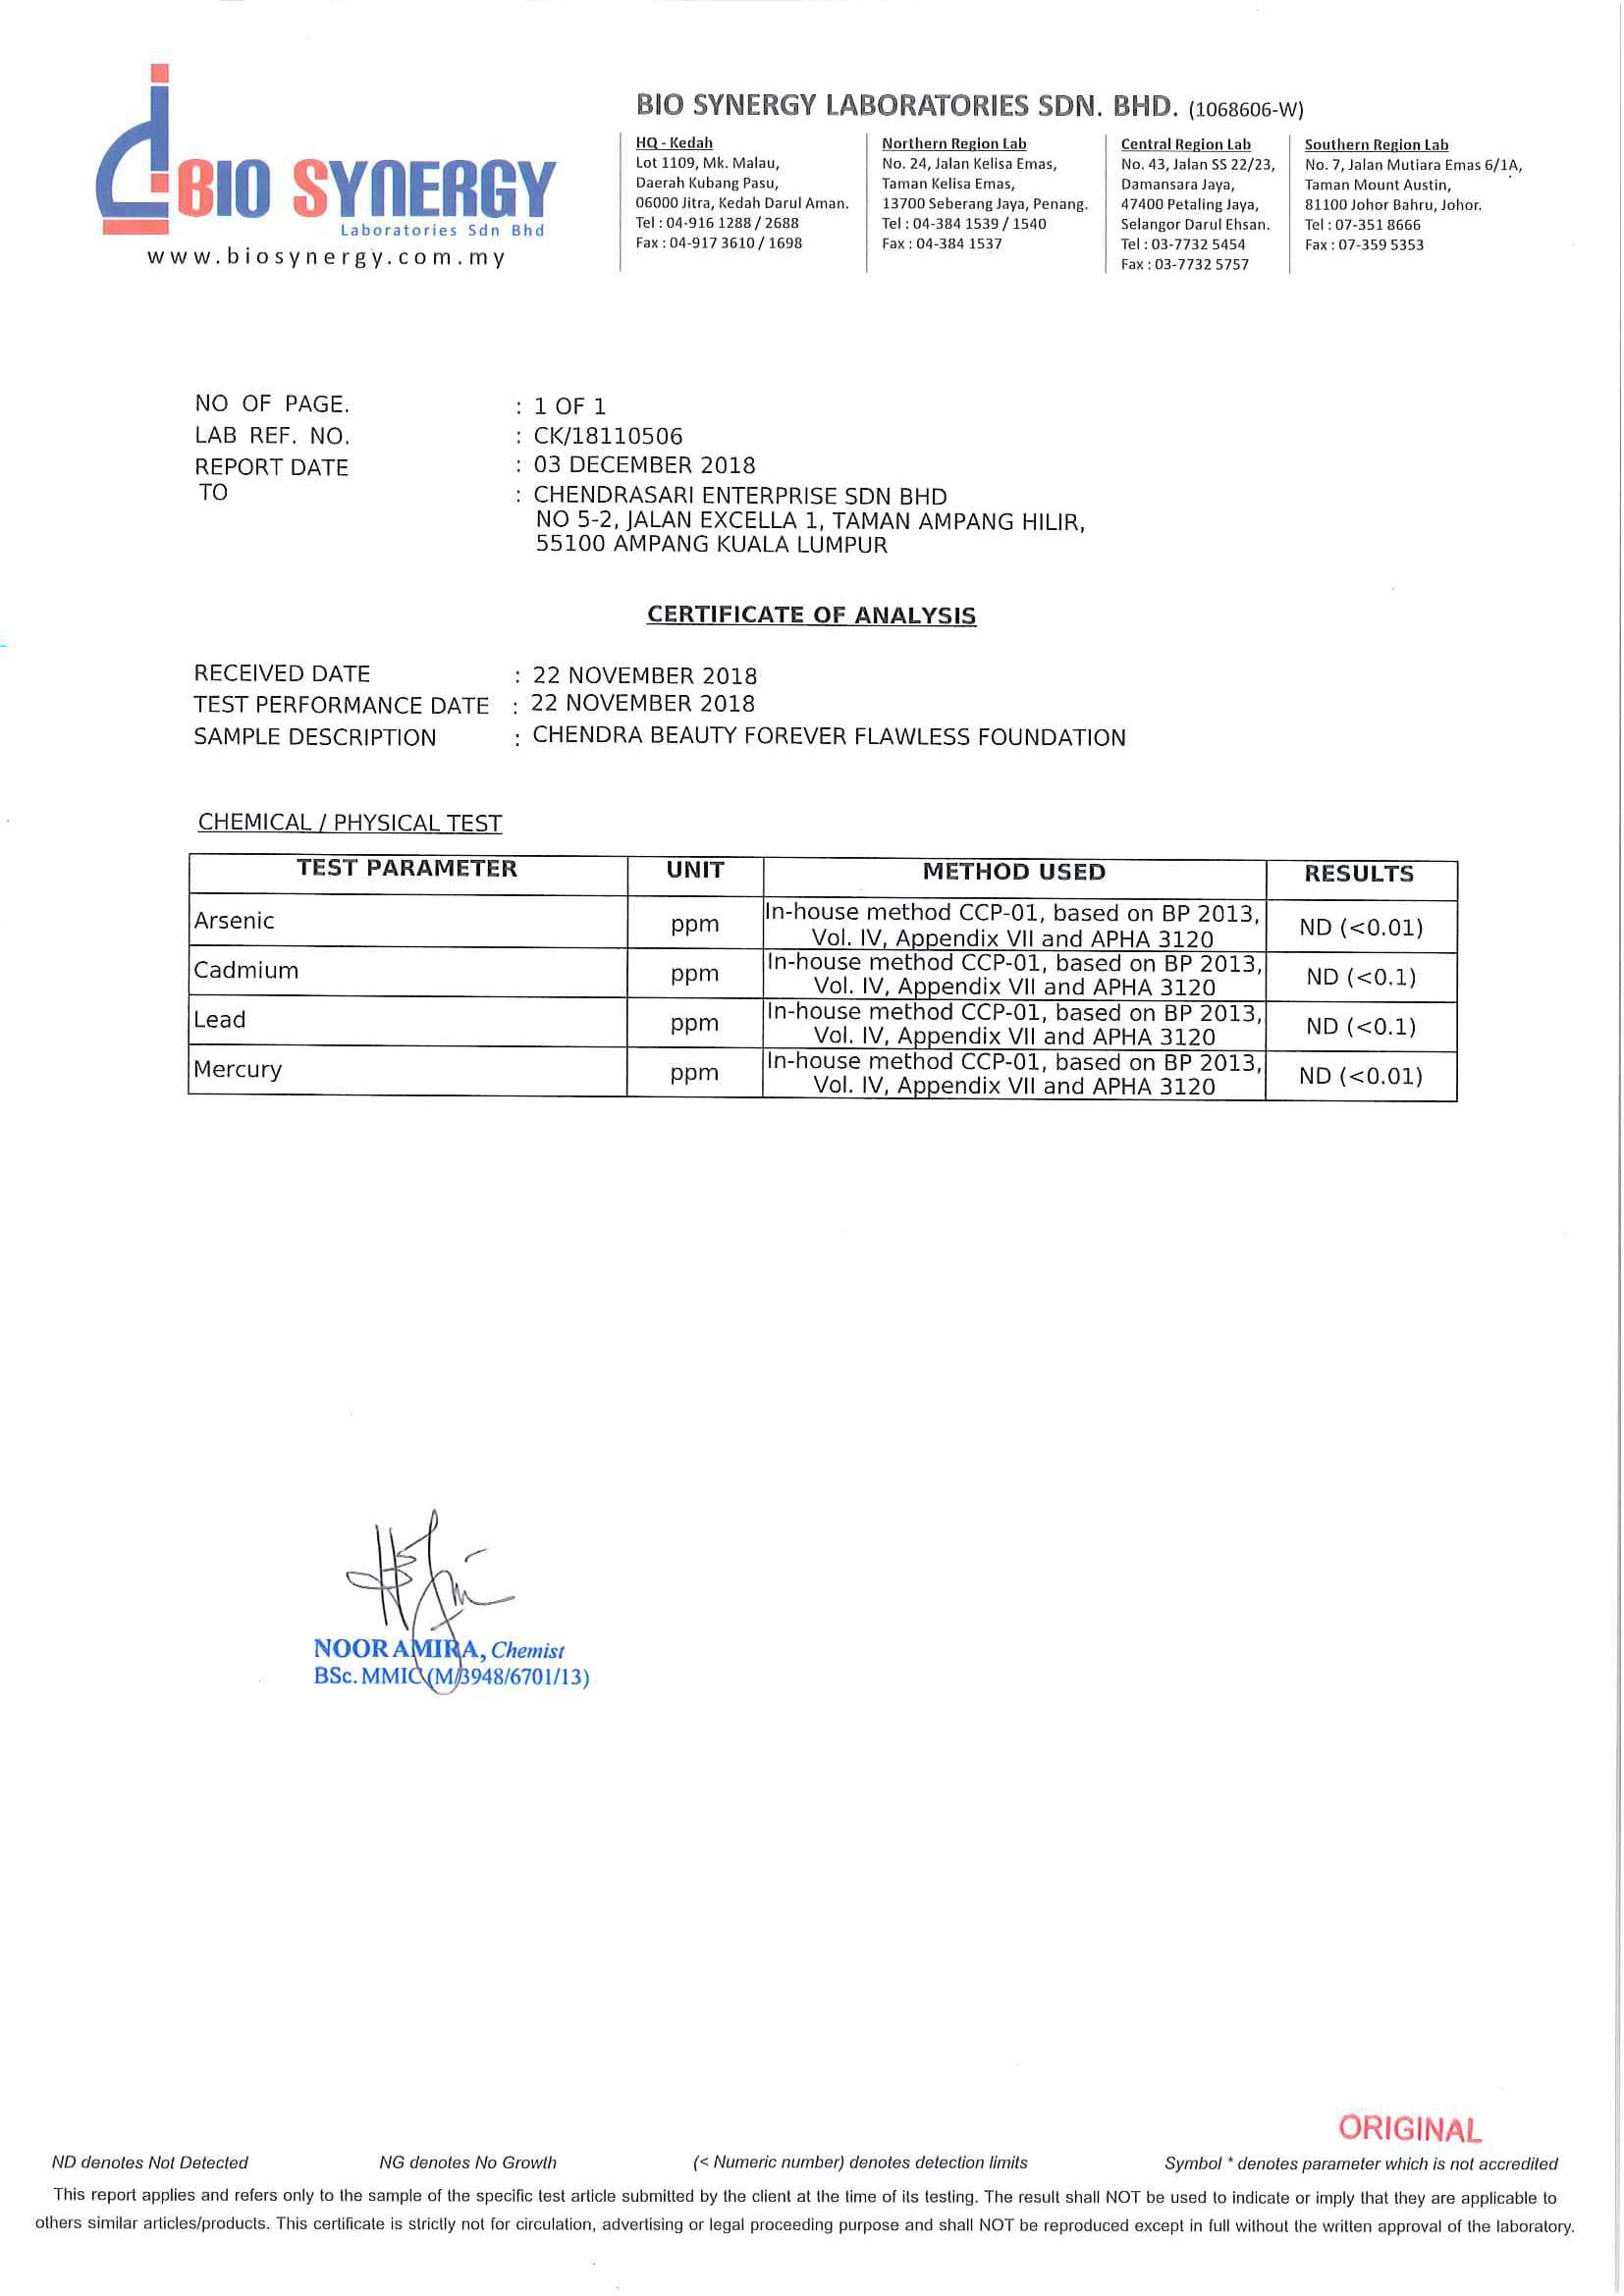 COA - Certificate of Analysis